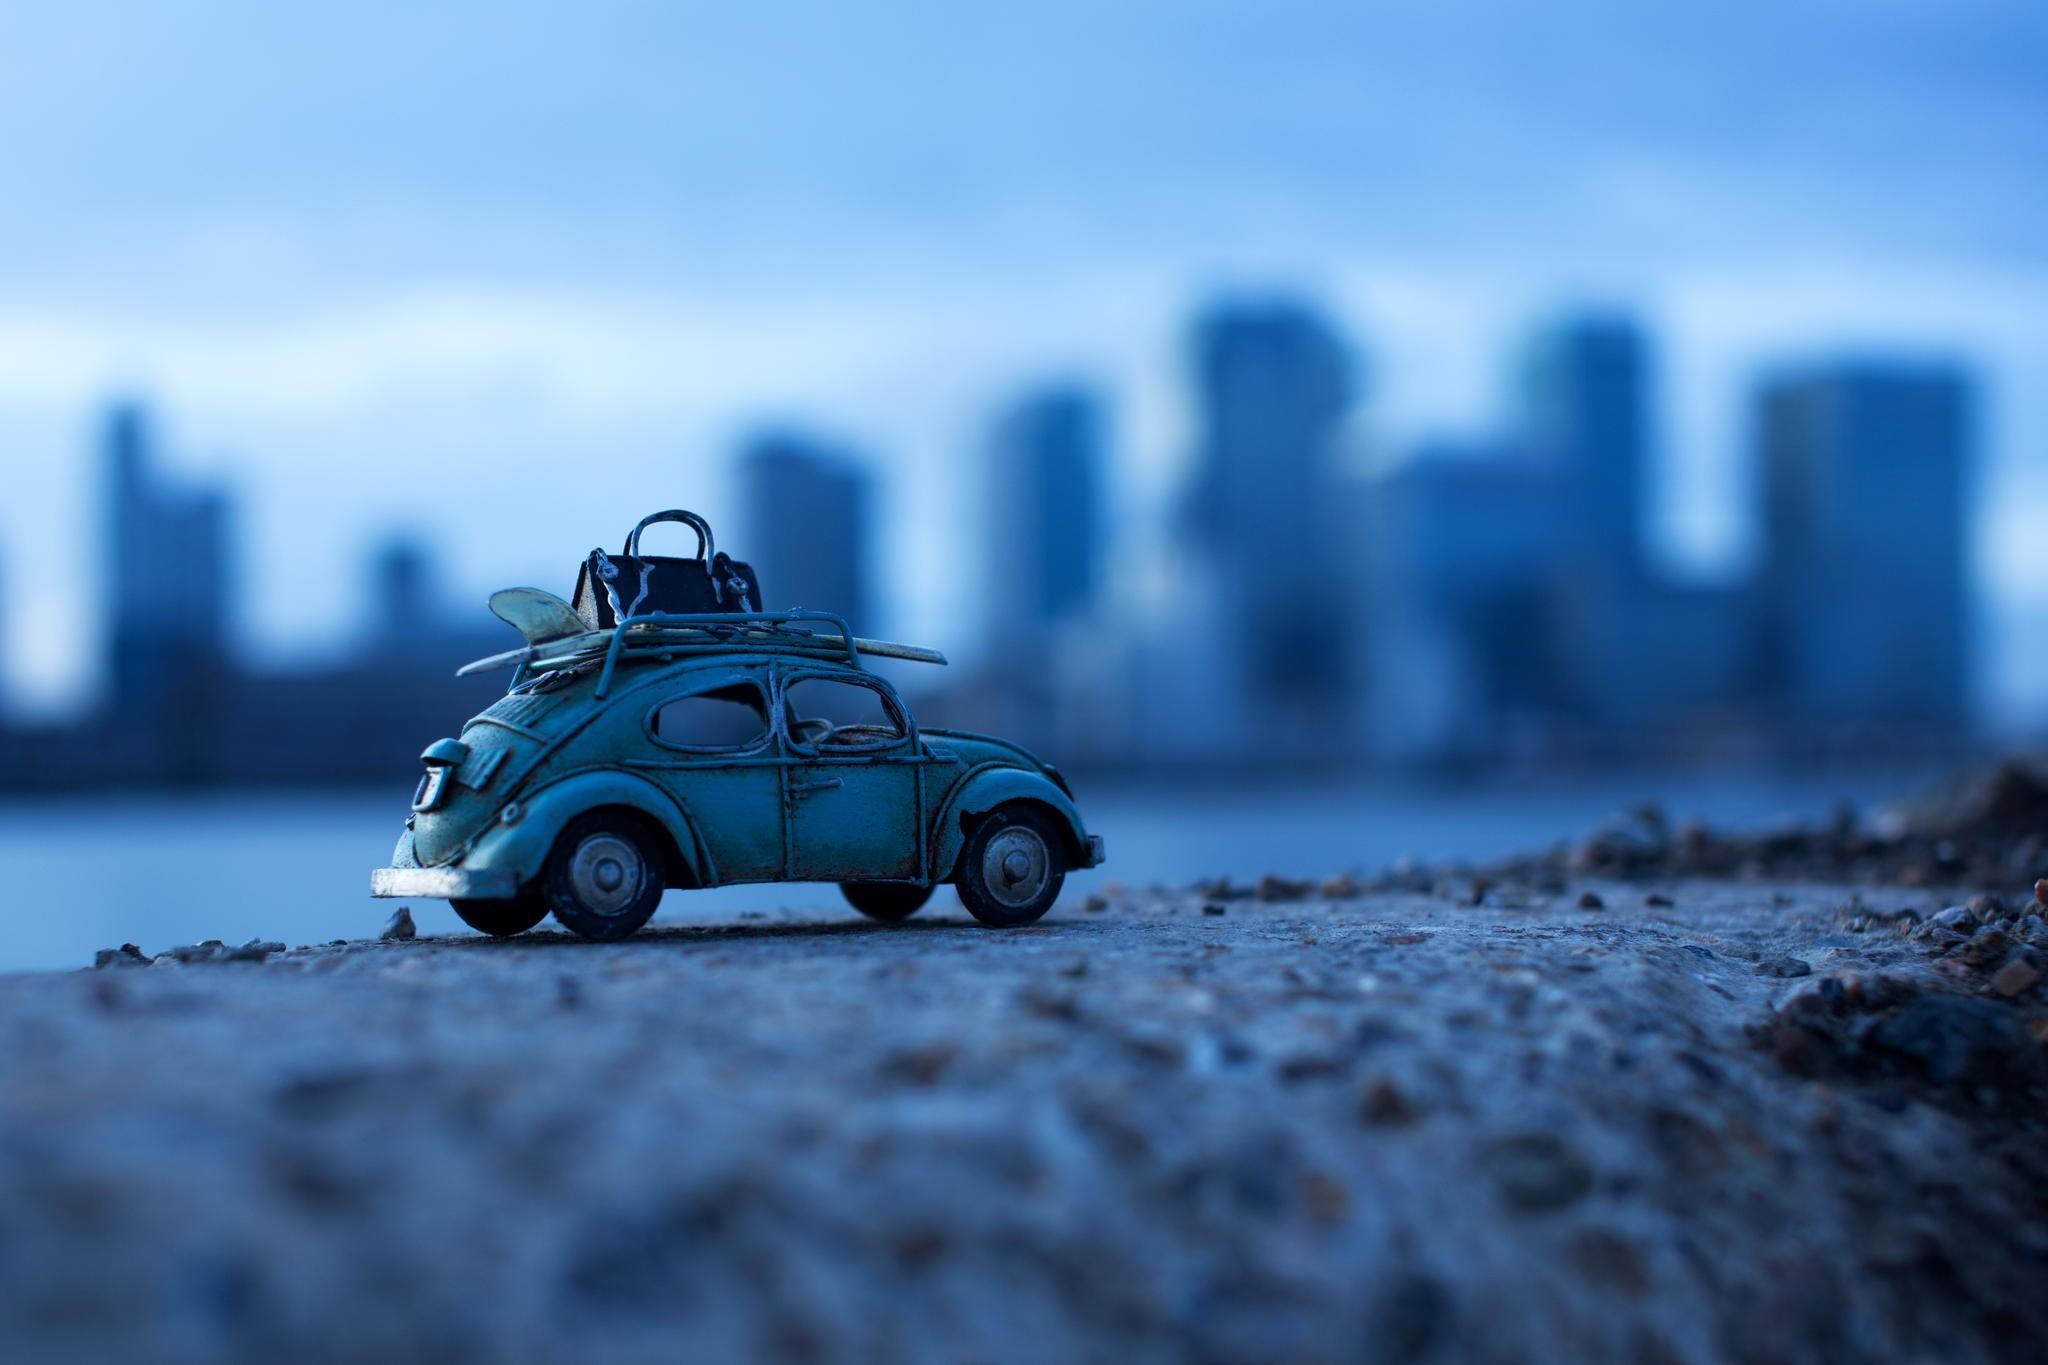 toys, Macro, Car, Depth Of Field, Volkswagen Beetle Wallpapers HD / Desktop  and Mobile Backgrounds